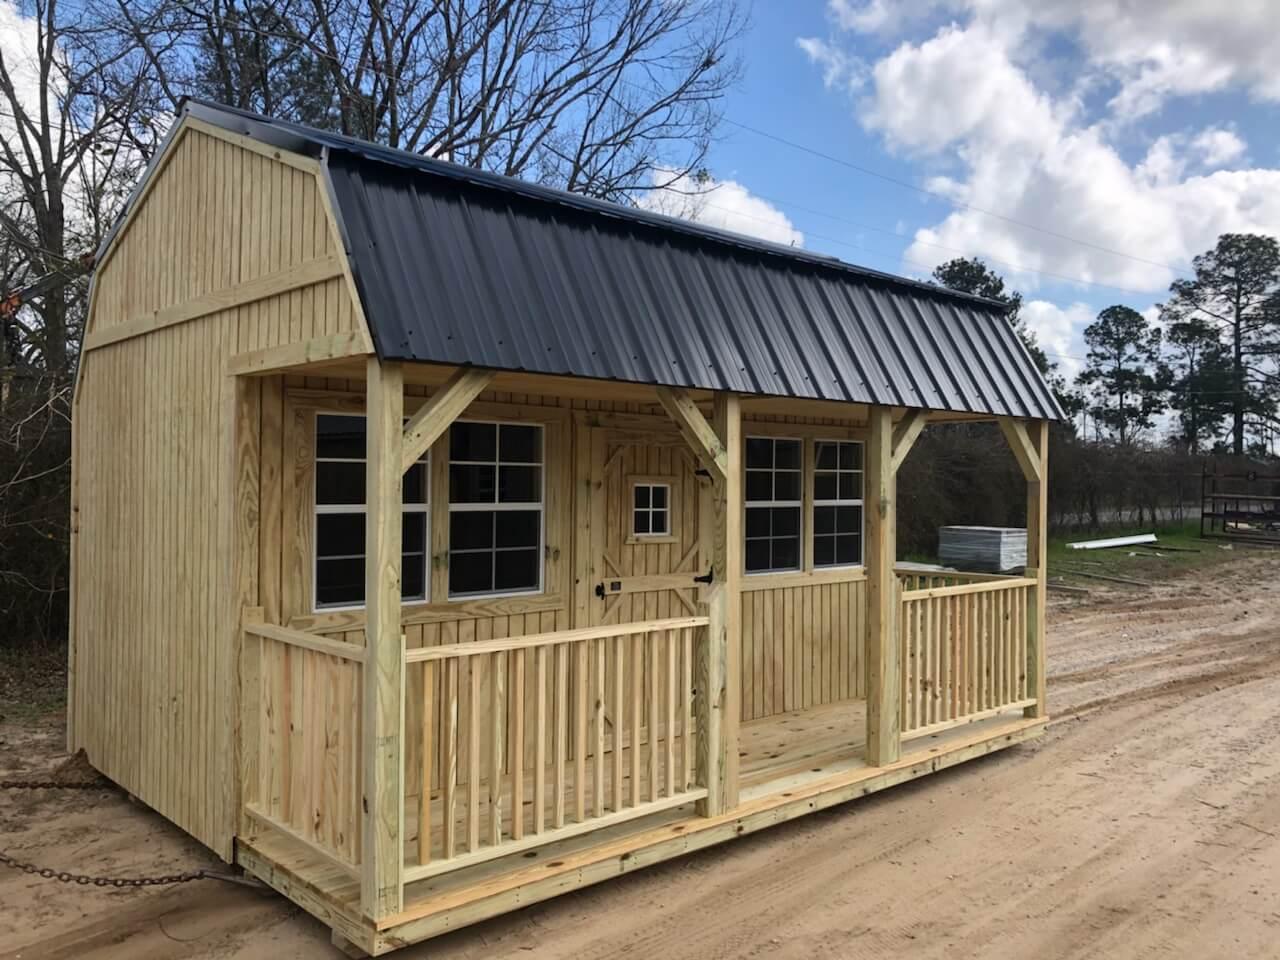 Porch Lofted Storage Barns